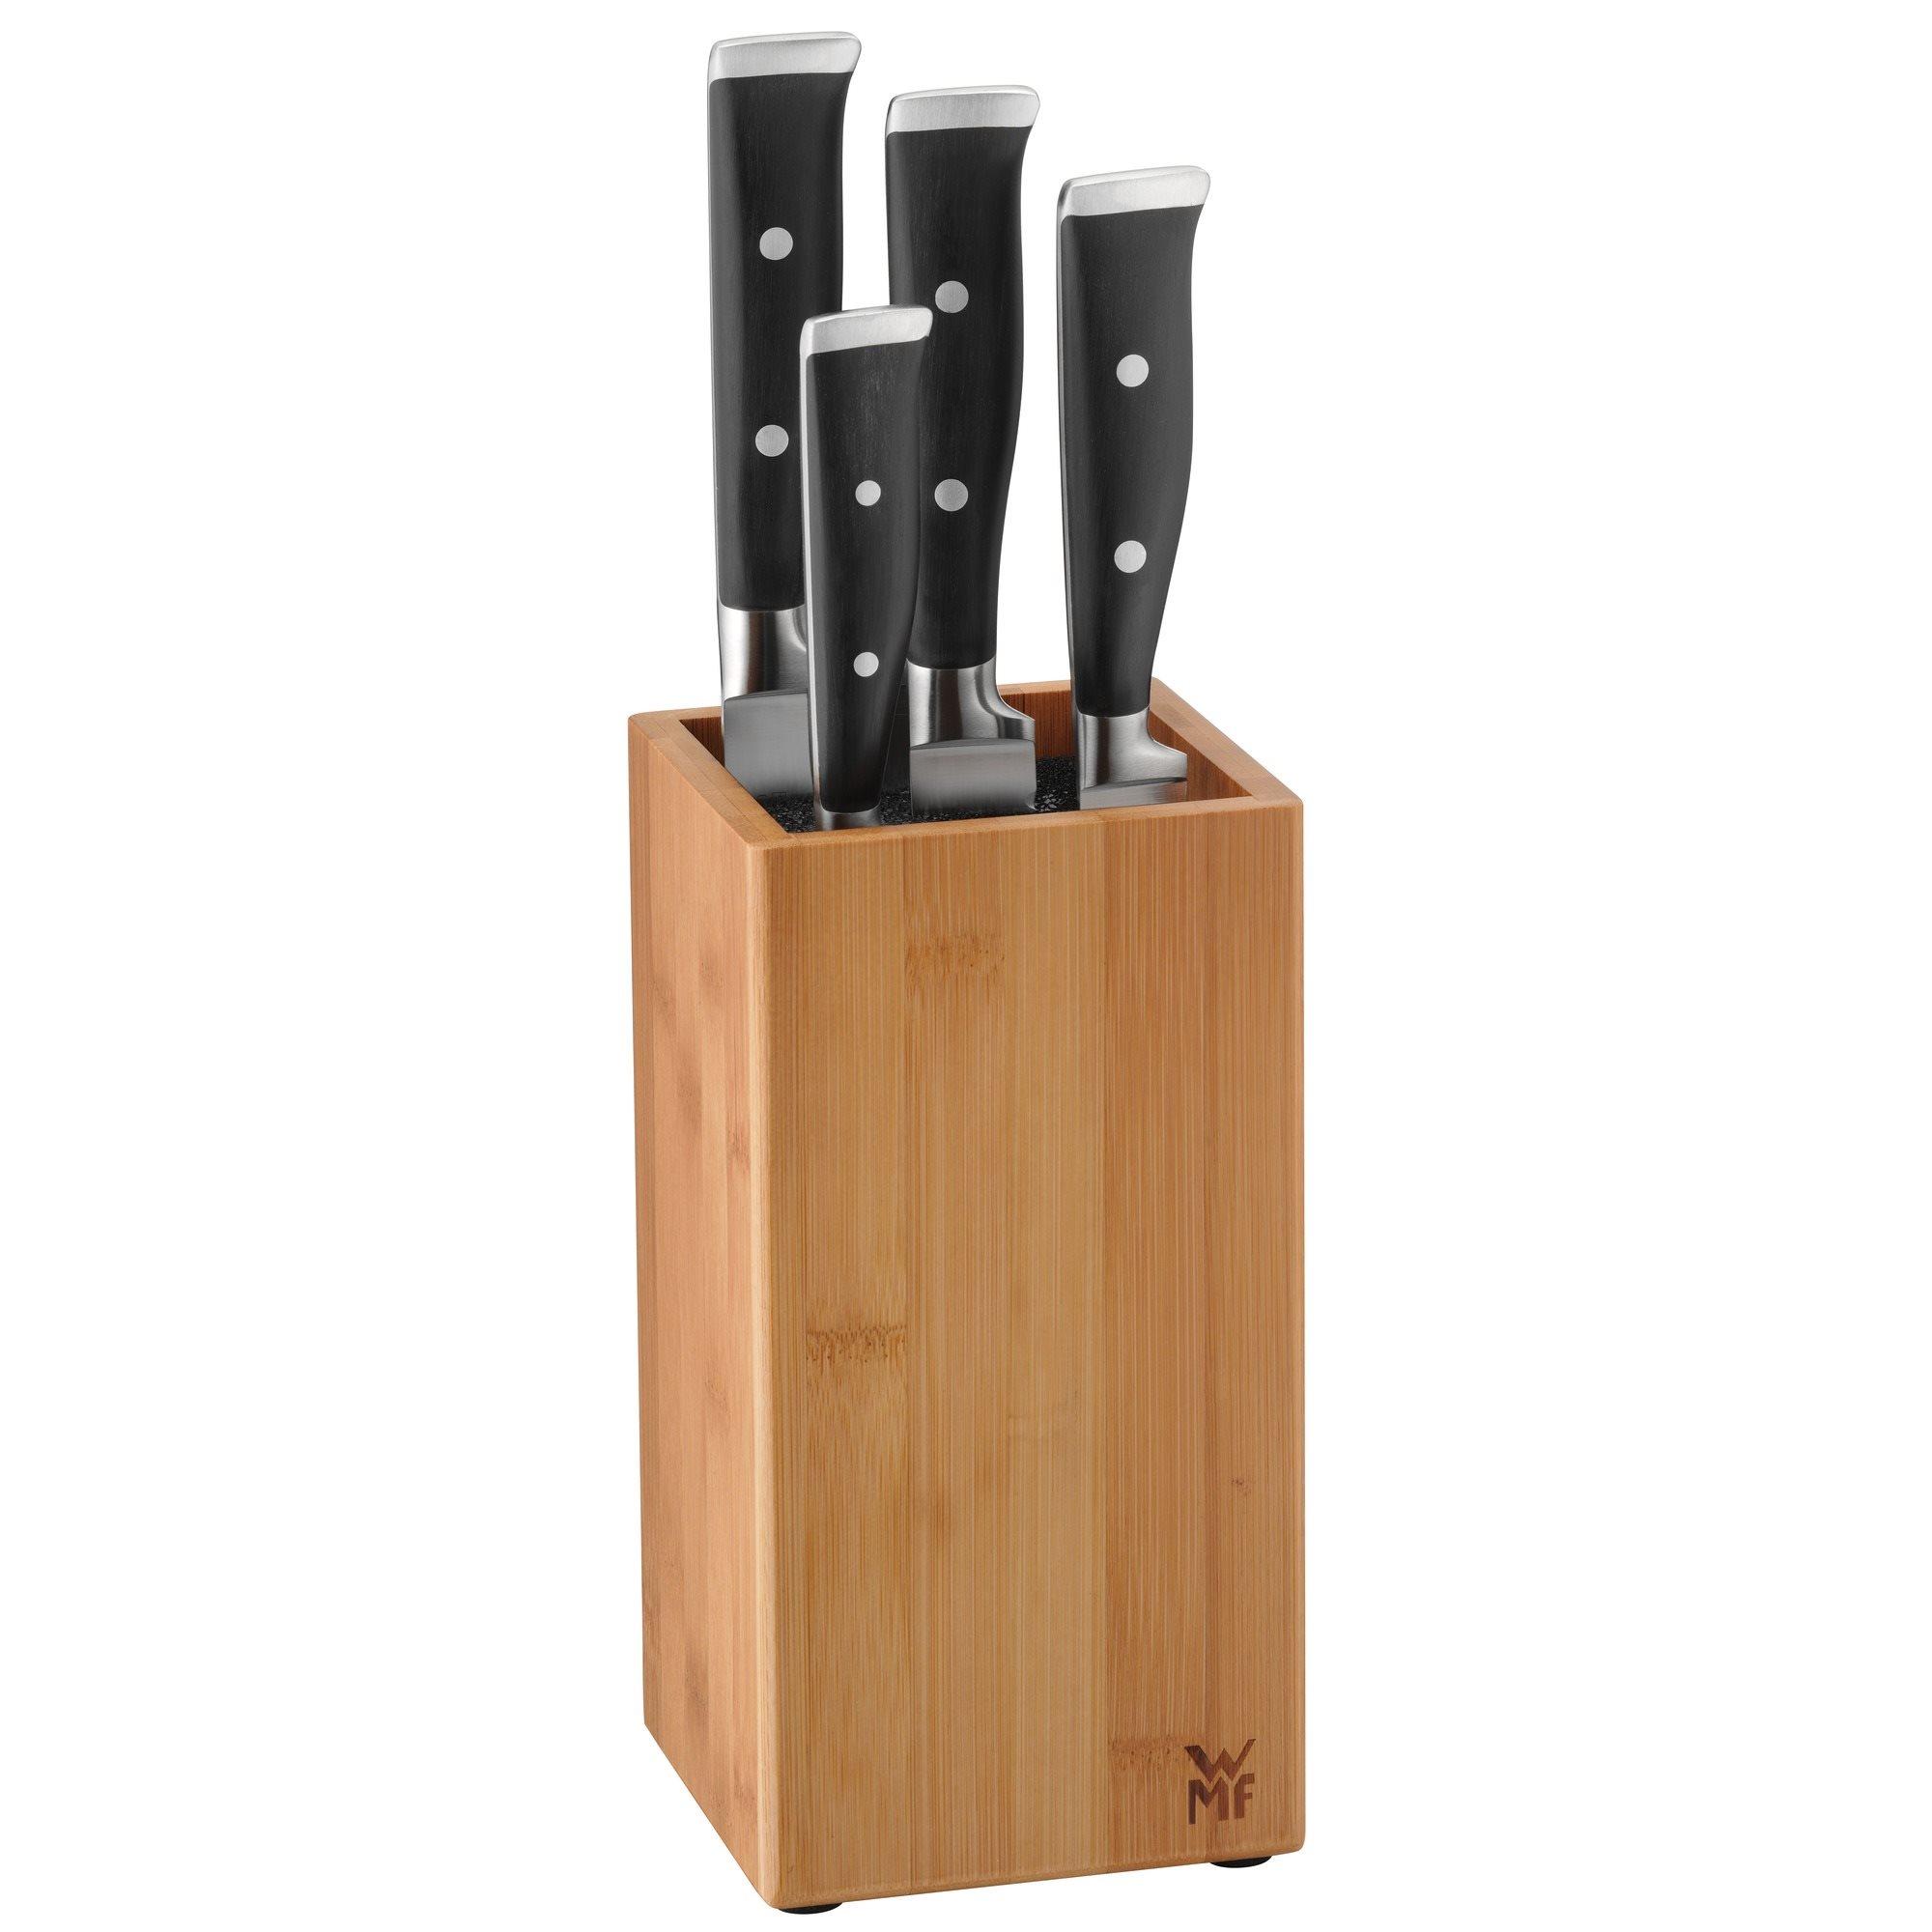 wmf messer set grand class 5 teilig messerblock performance cut ebay. Black Bedroom Furniture Sets. Home Design Ideas